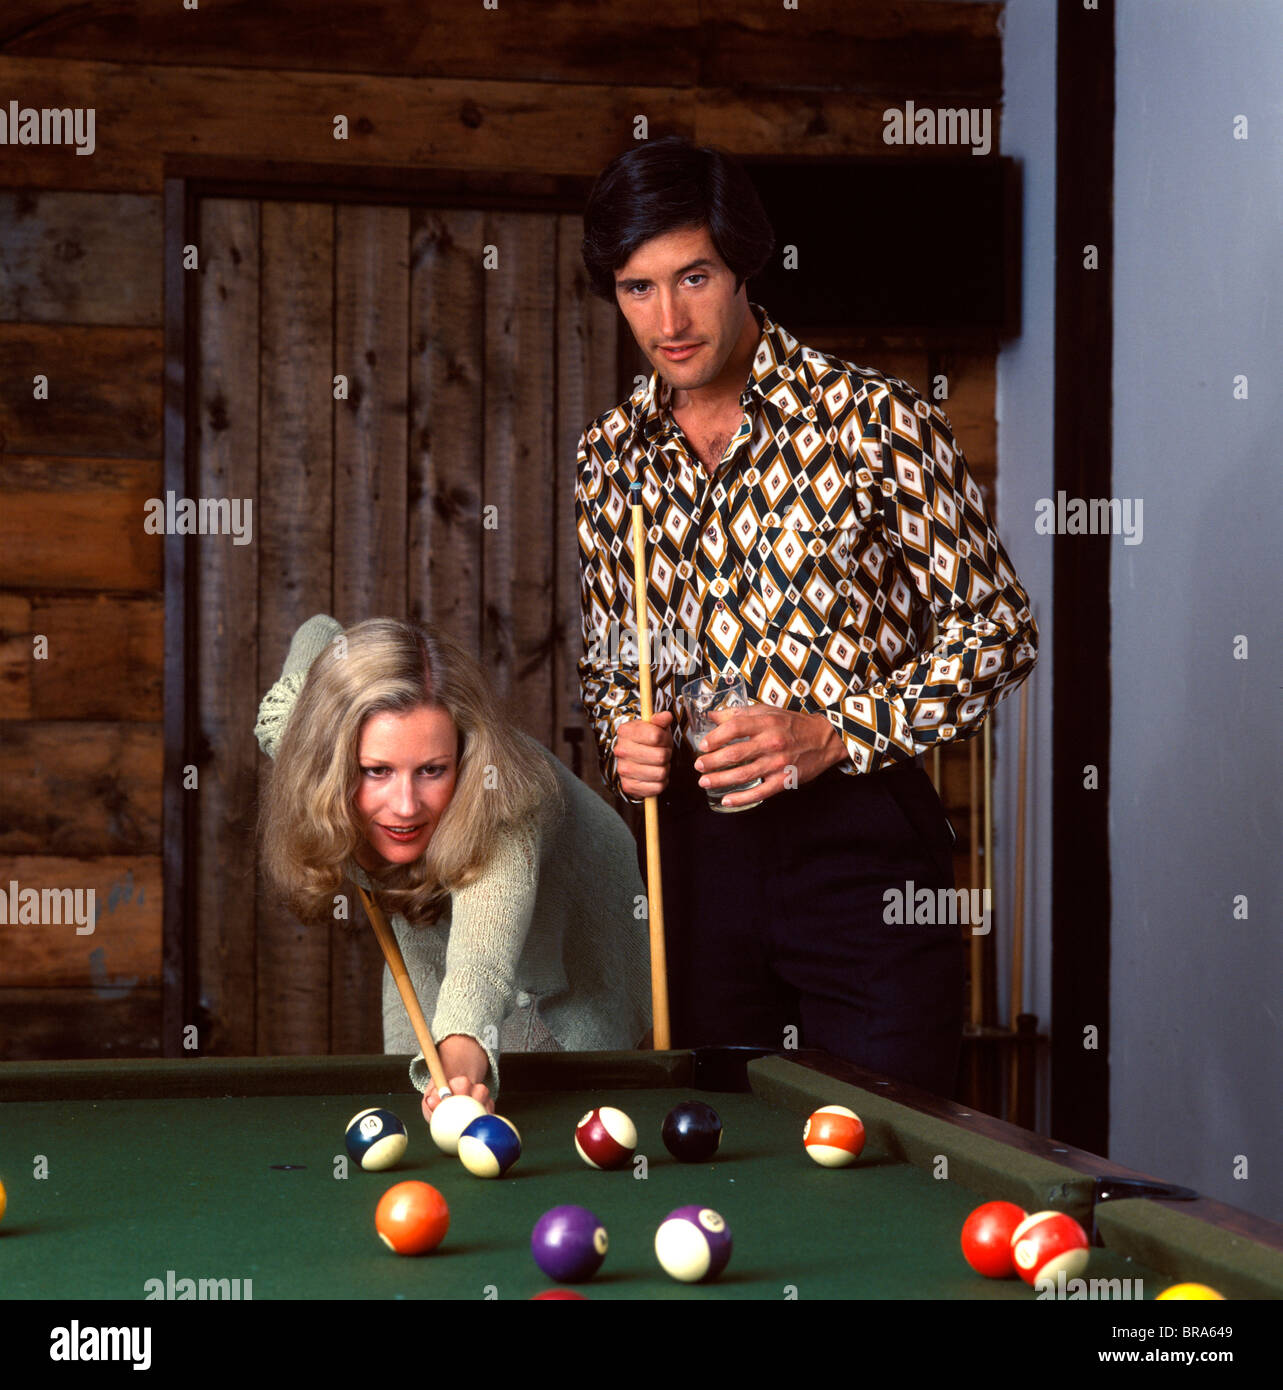 dating billiard balls dating sites pop